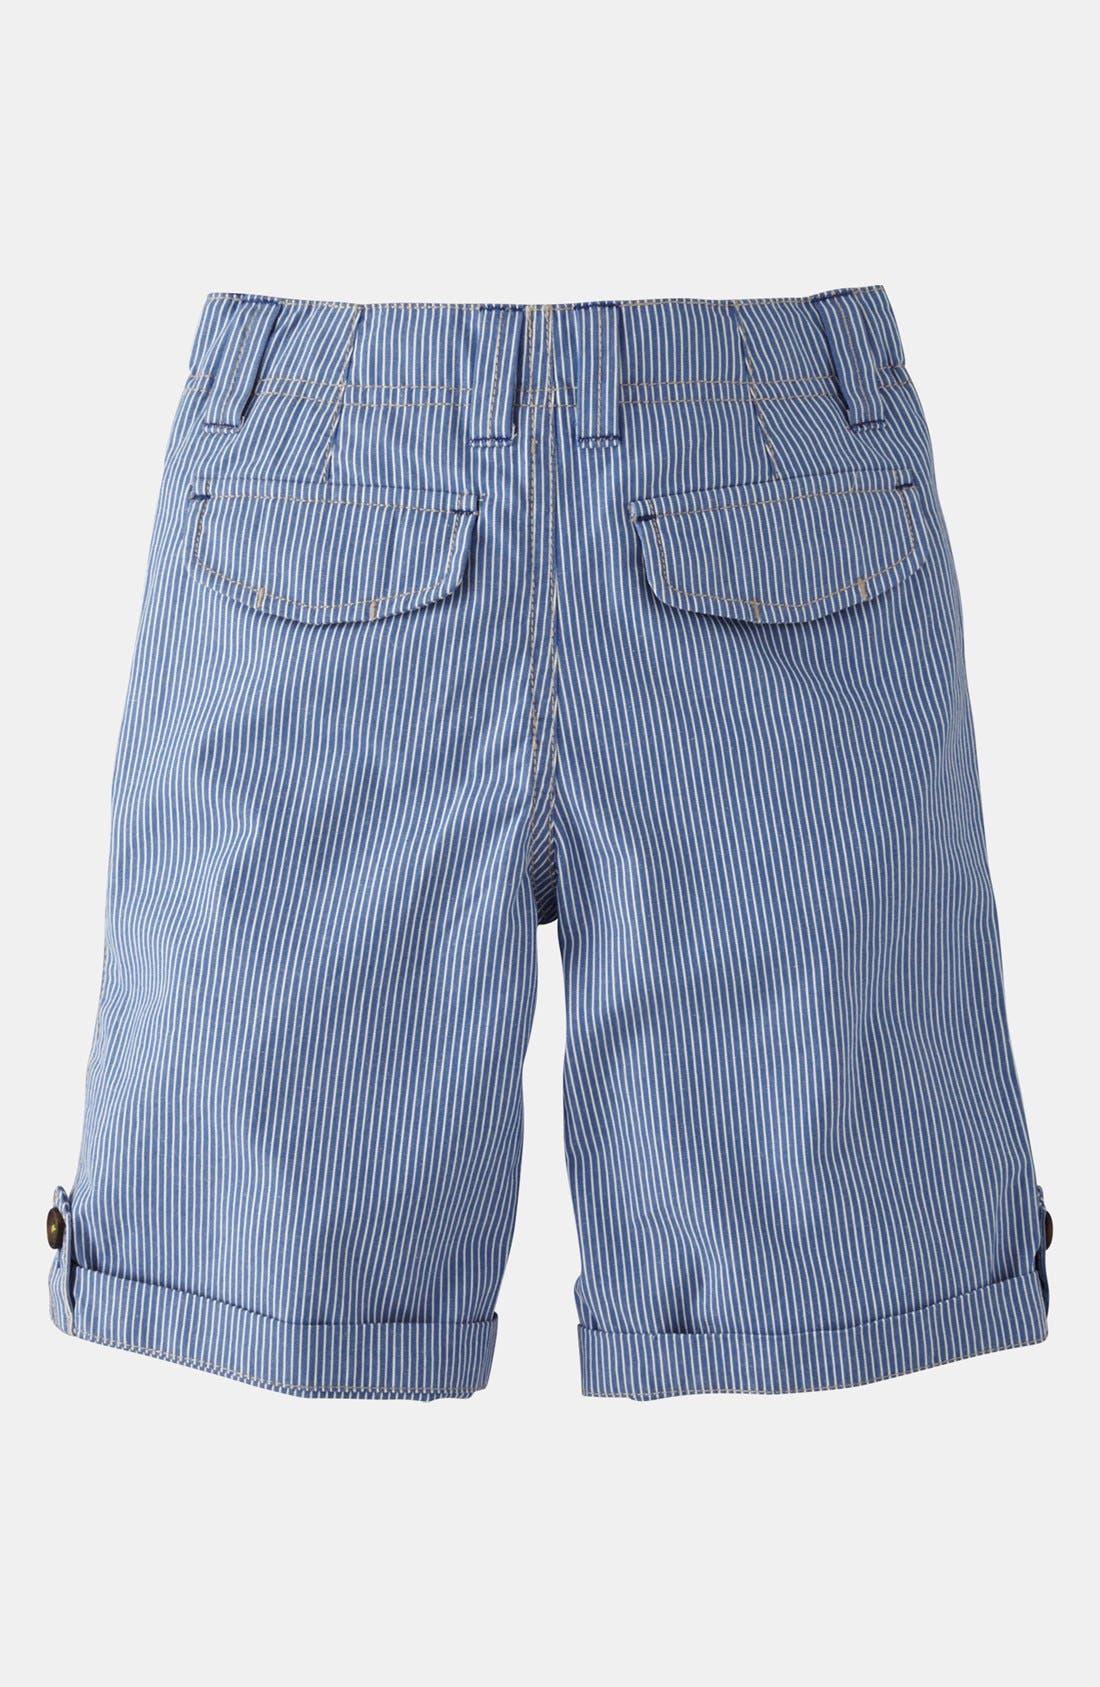 Main Image - Mini Boden Summer Shorts (Little Boys & Big Boys)